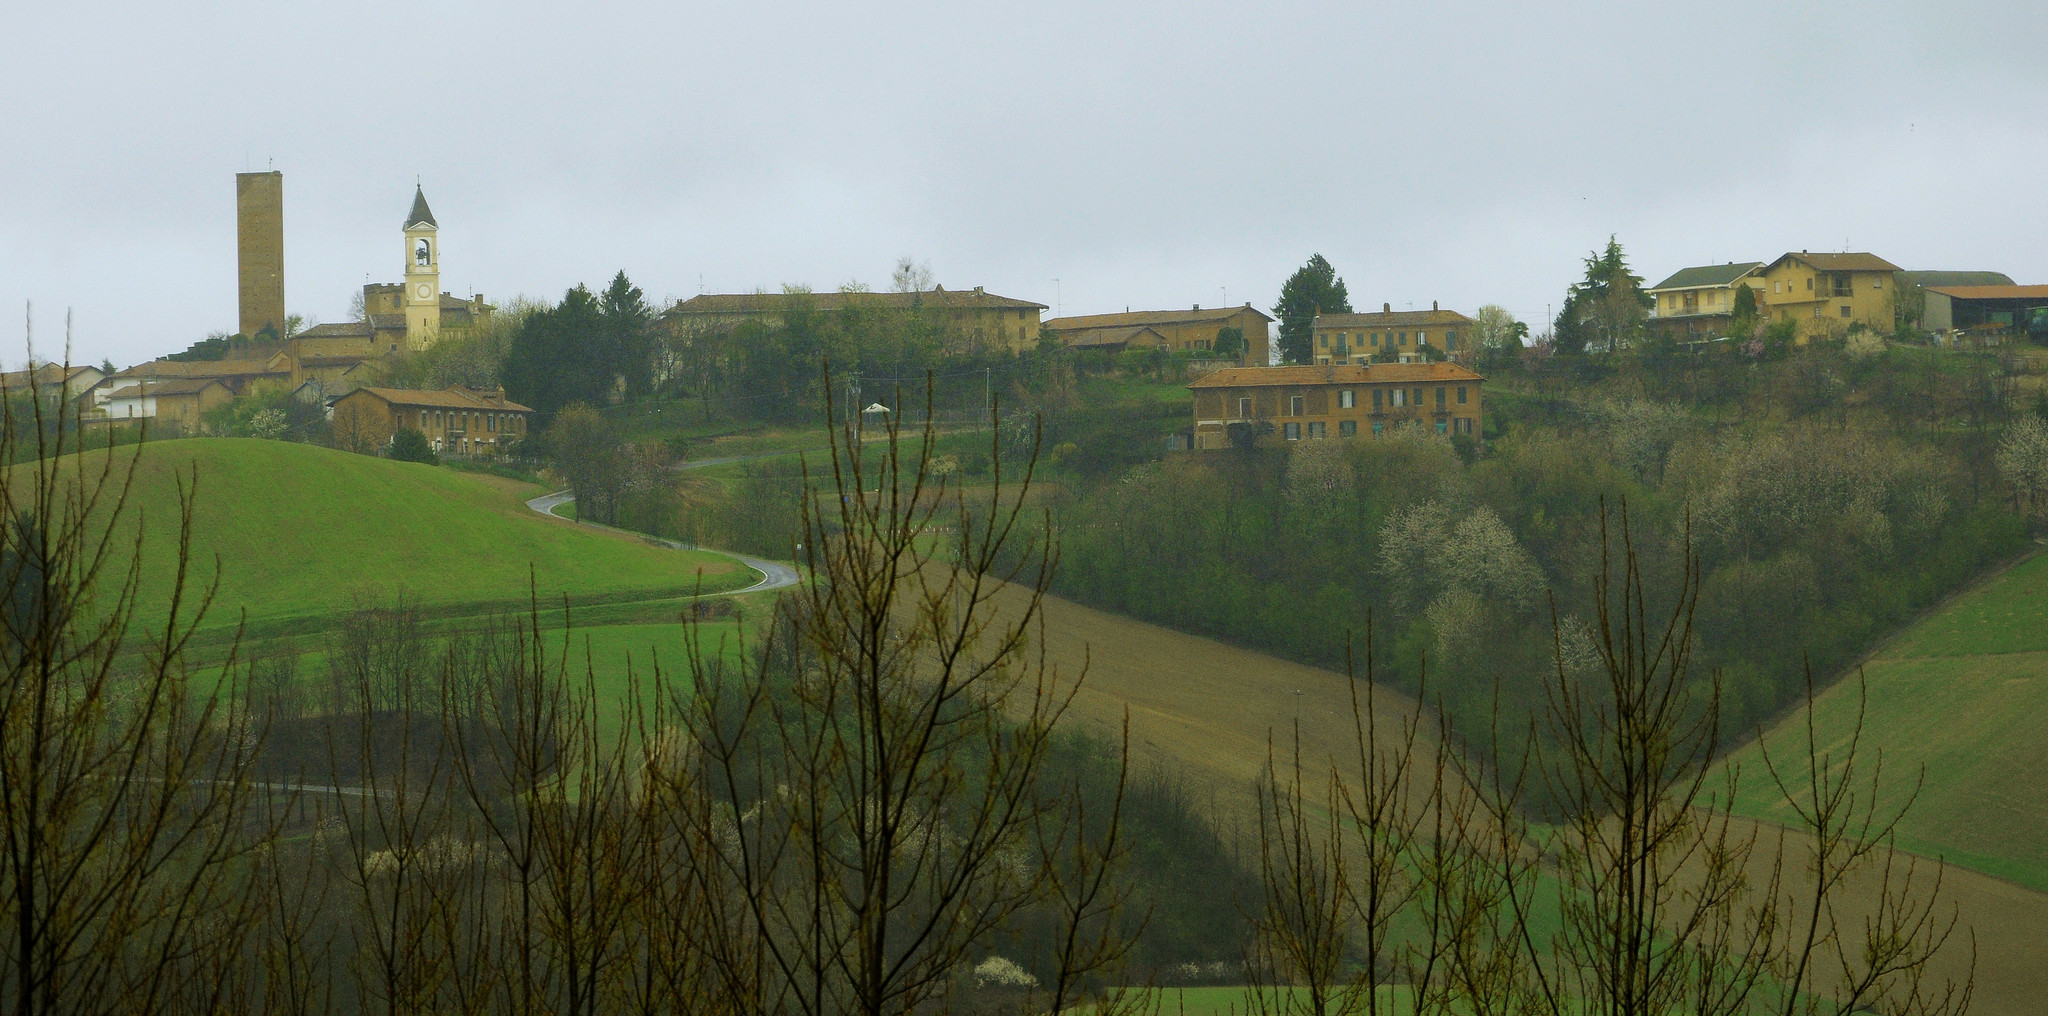 Montechiaro d'Asti